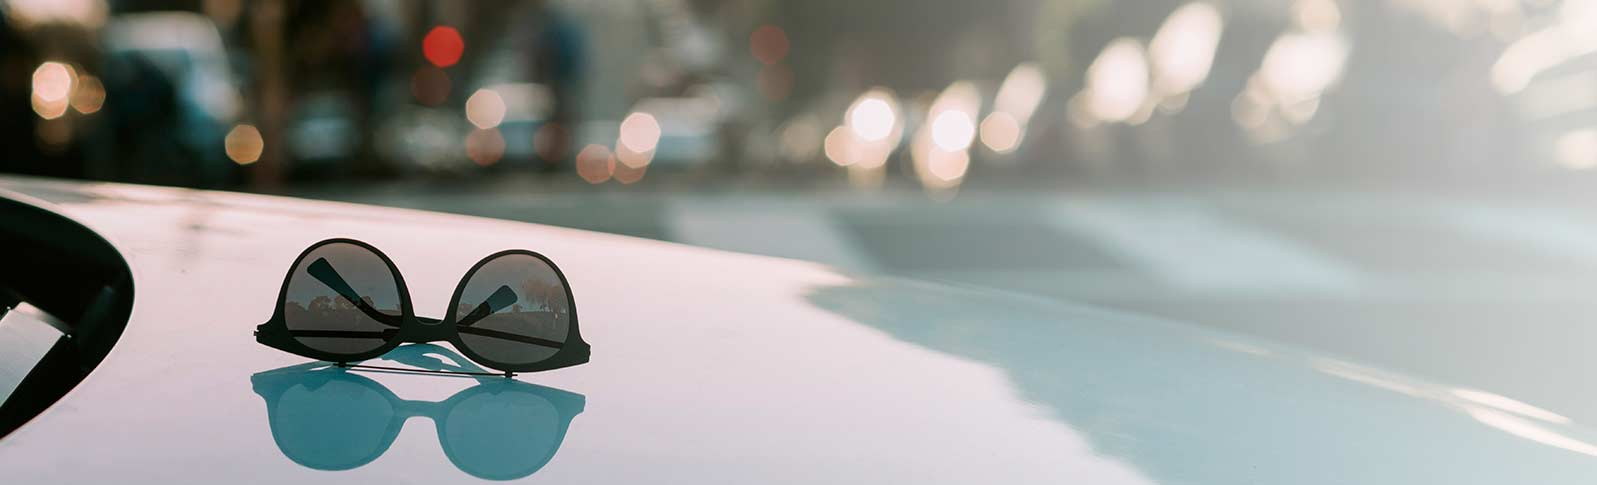 sunglasses on a car dashboard